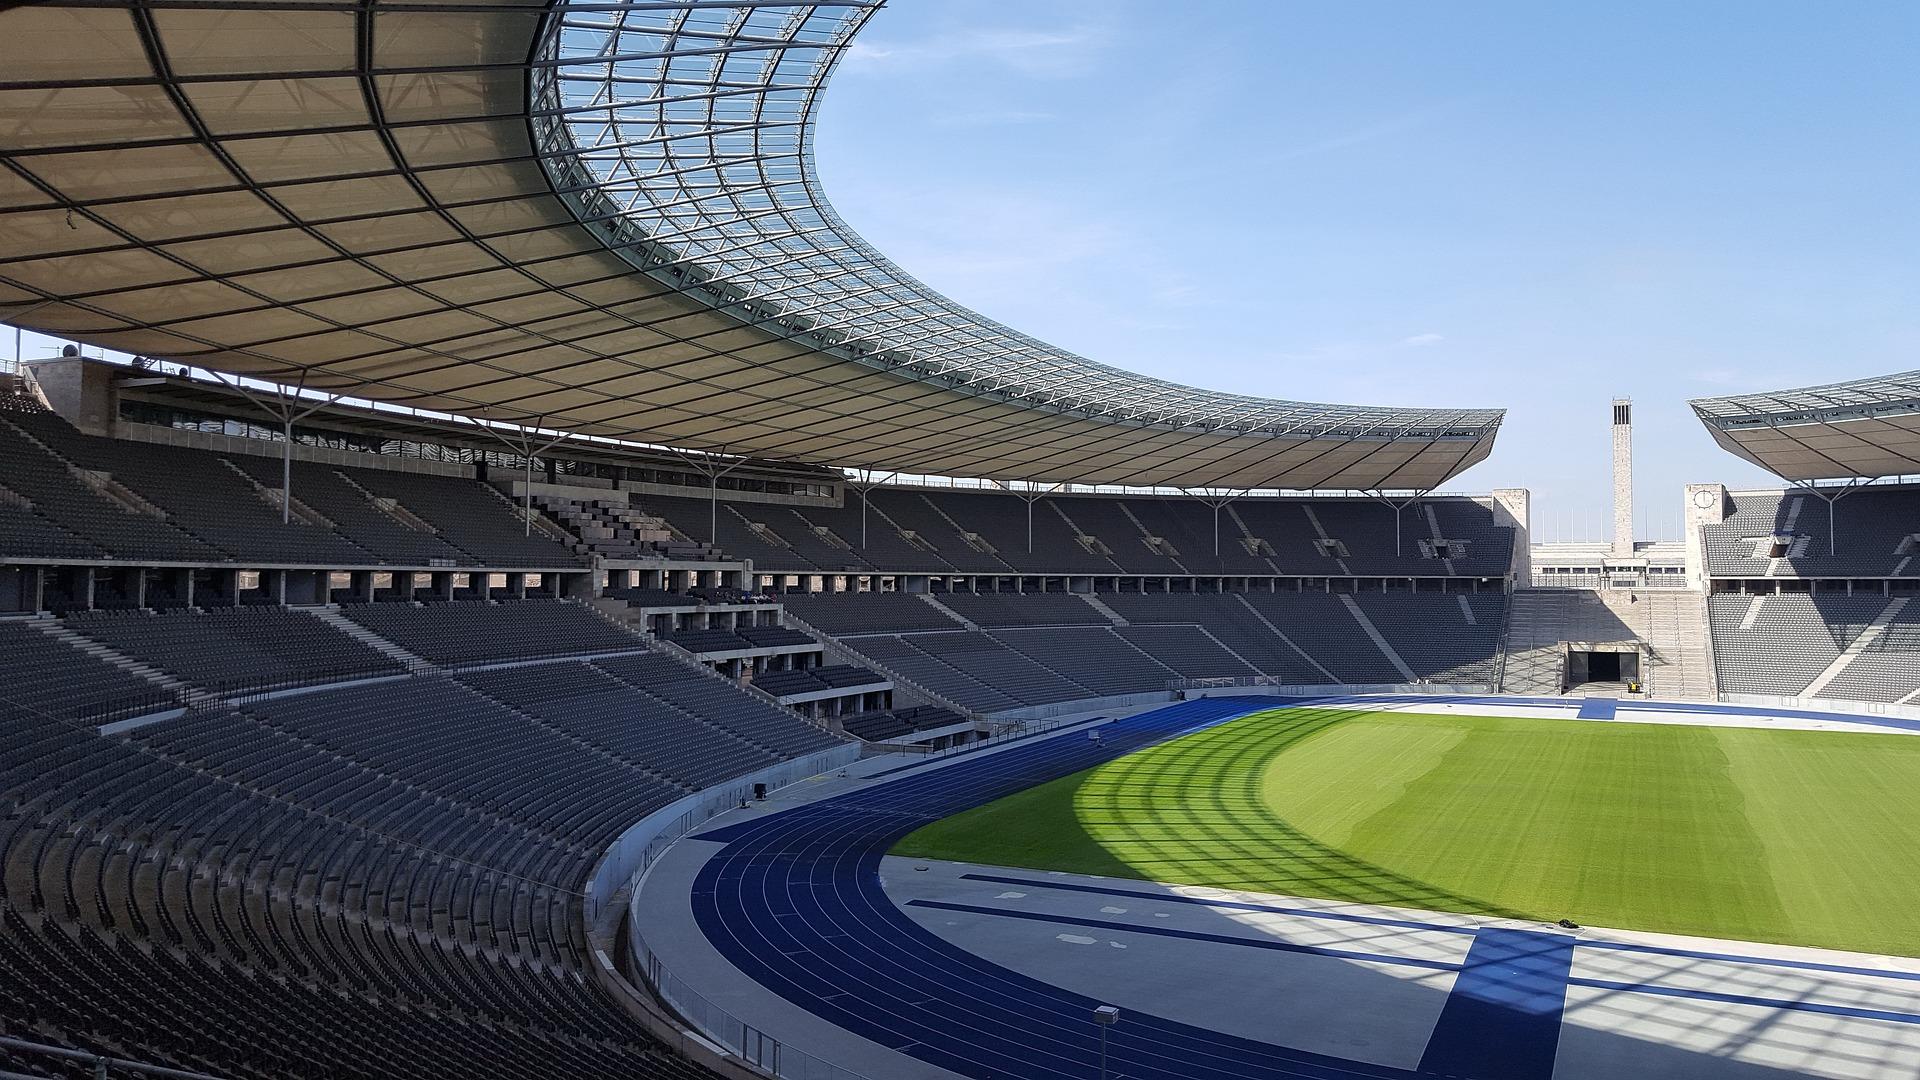 olympic-stadium-2658628_1920.jpg